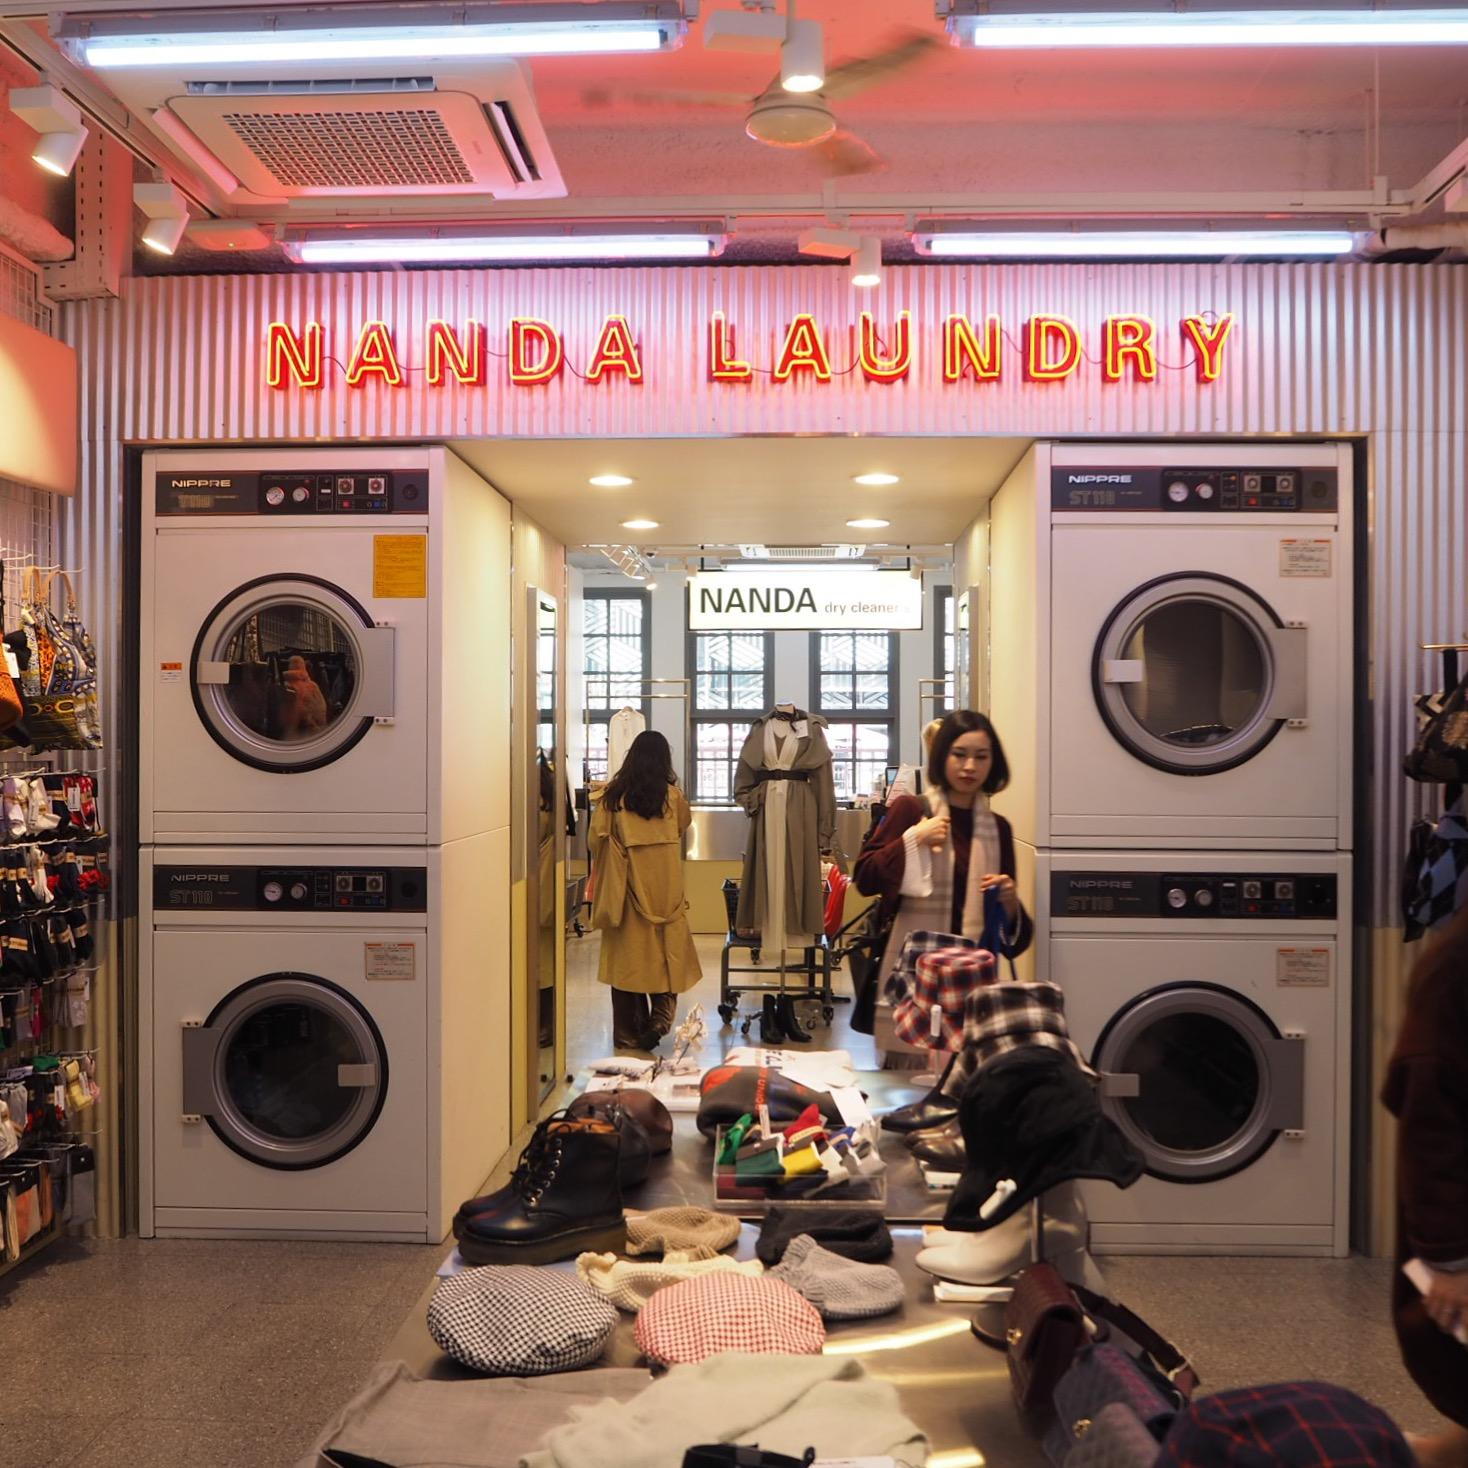 Style Nanda - Nanda Laundry. Inspirational store in Seoul, South Korea.